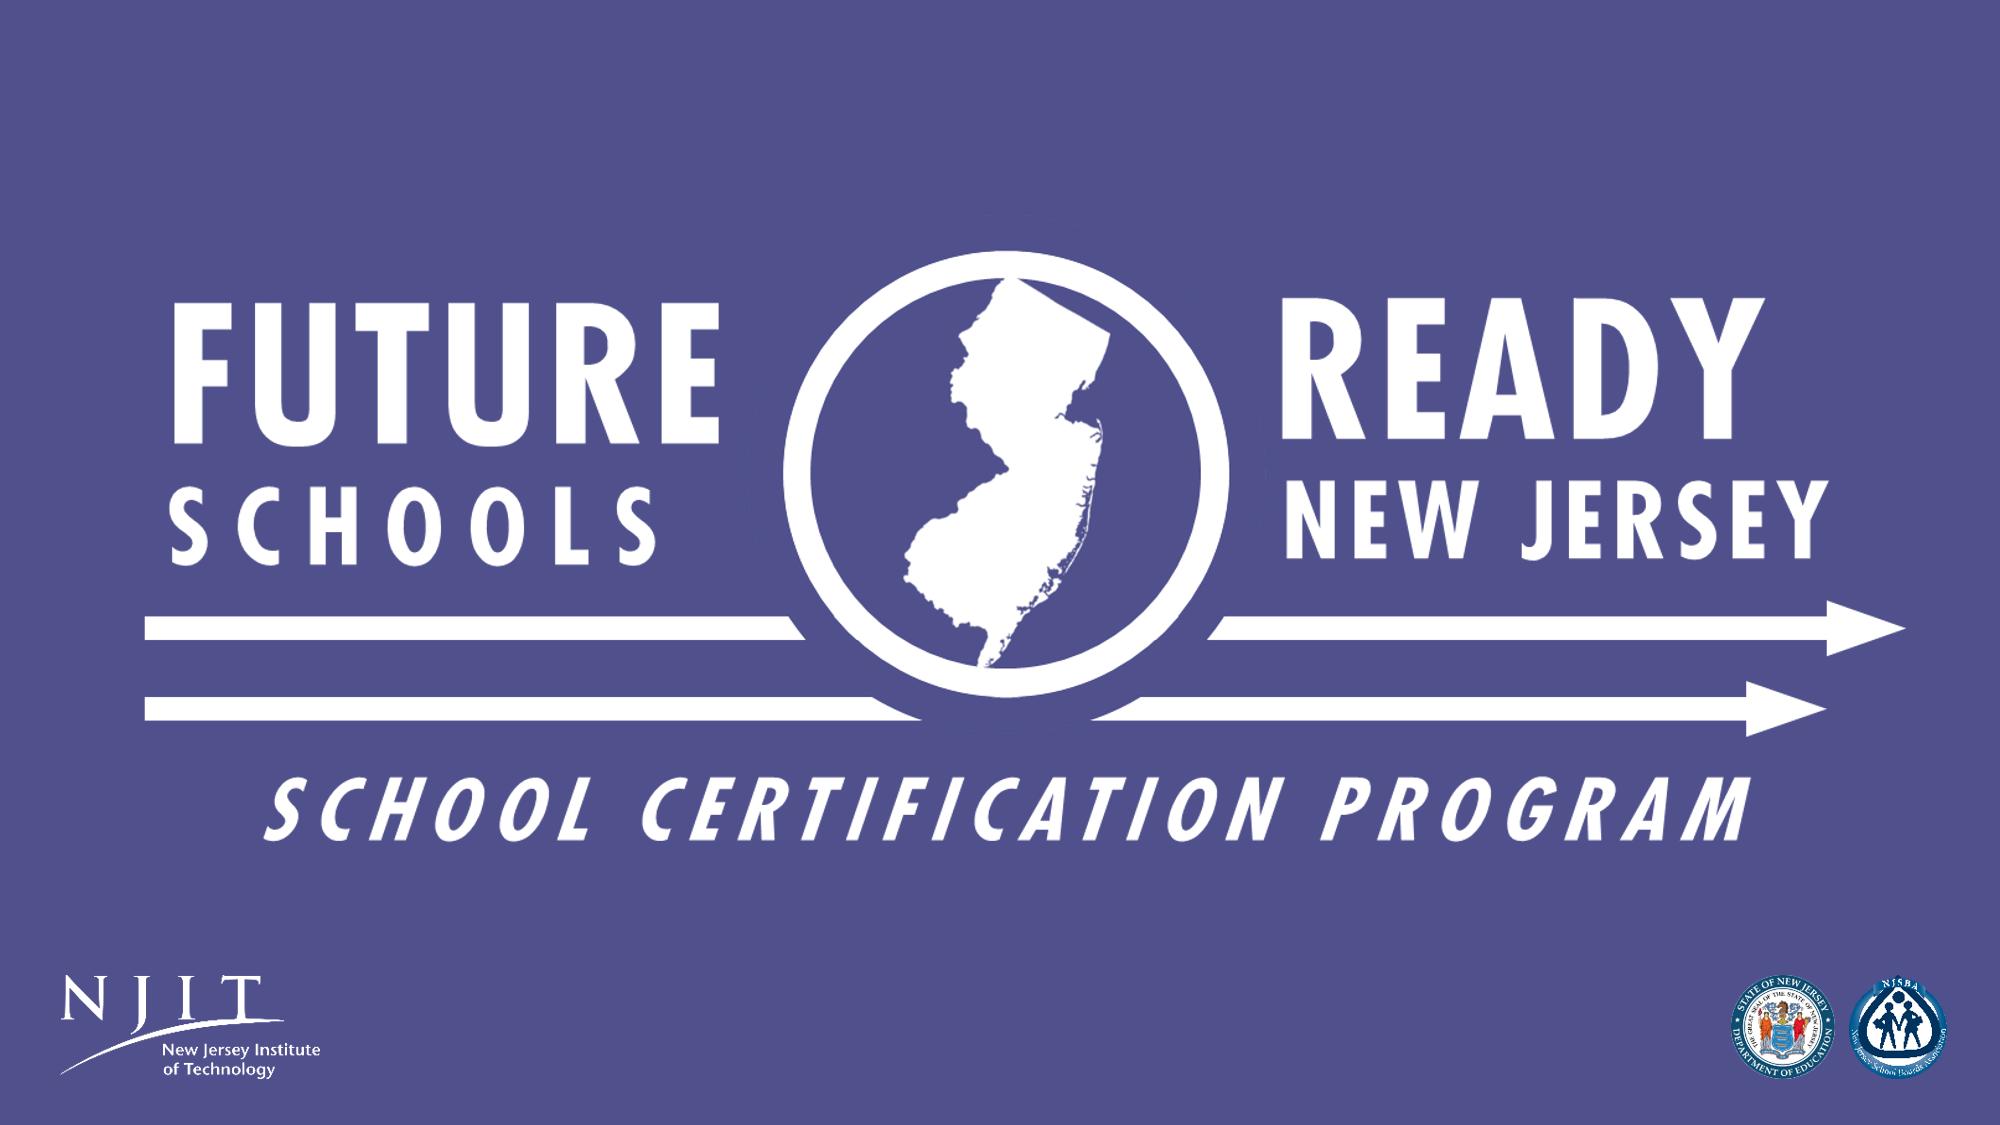 Future Ready Schools New Jersey